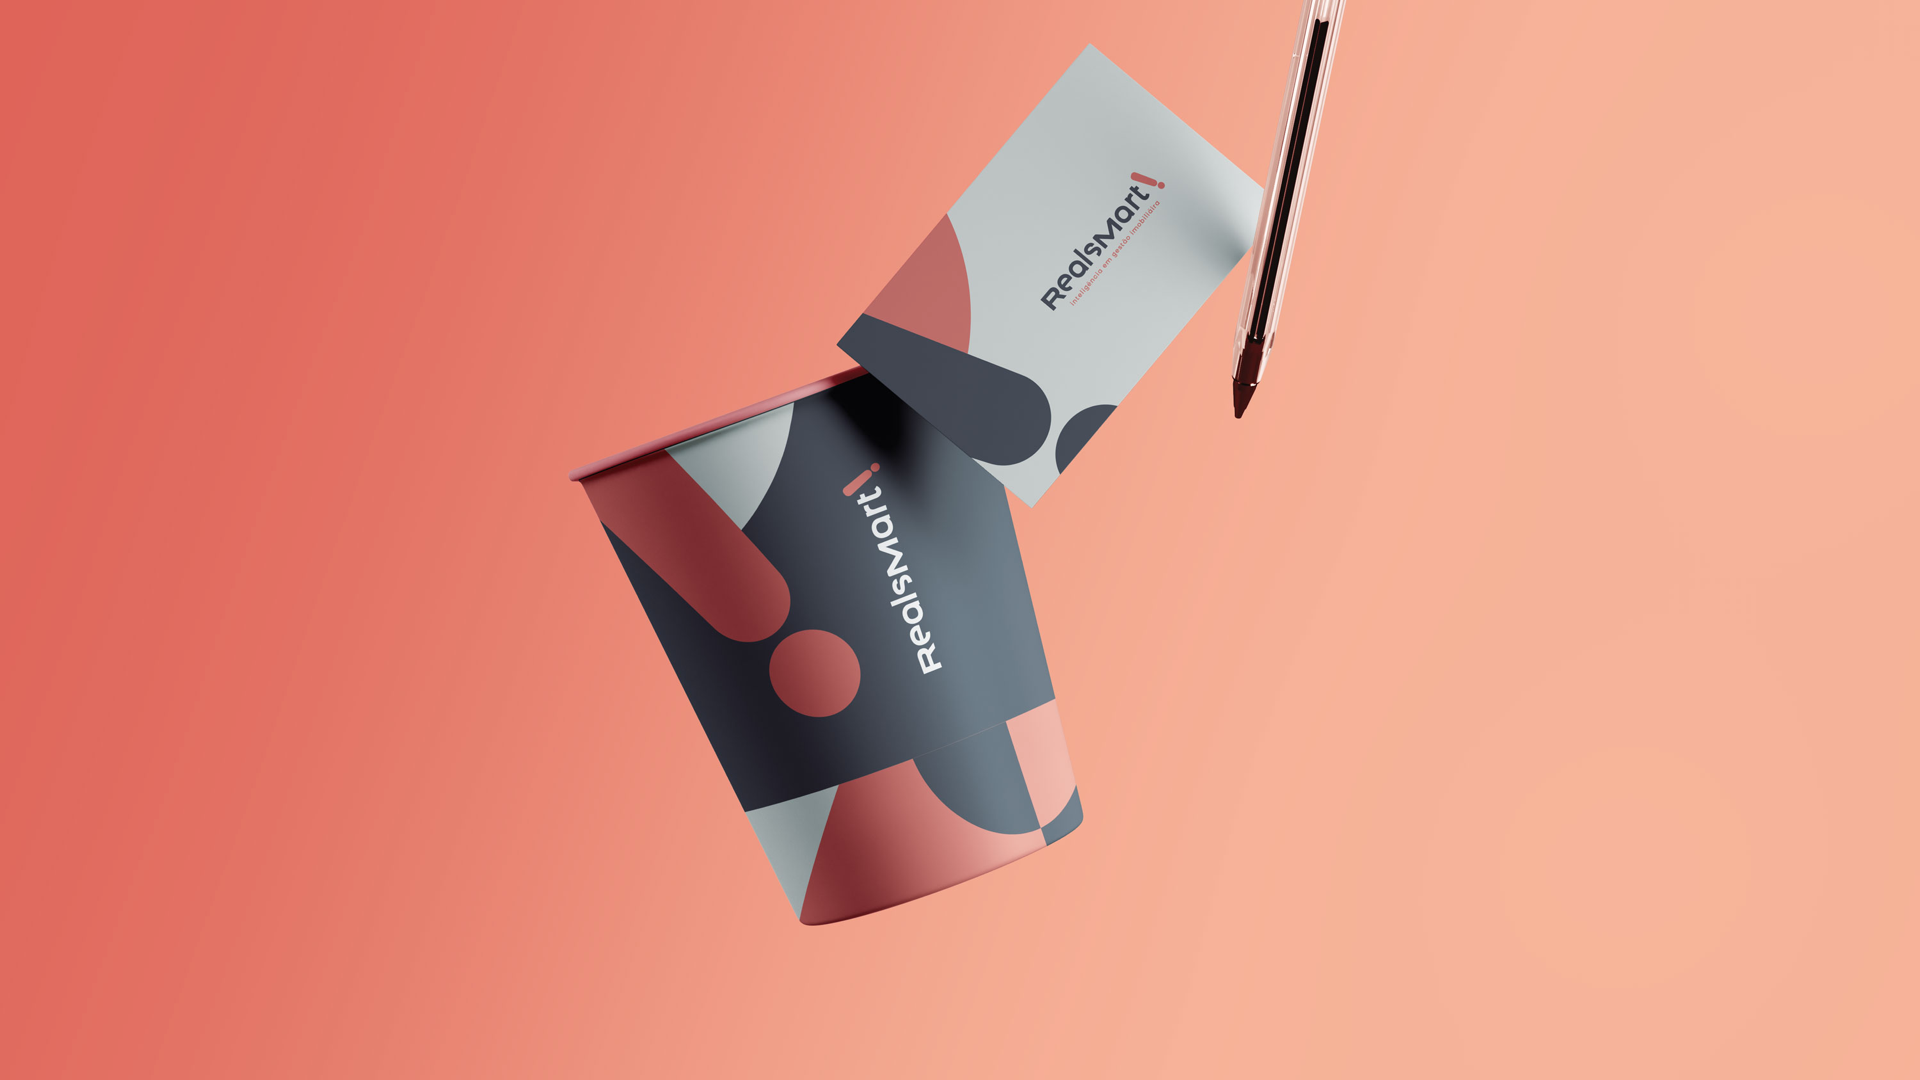 Projetos / Realsmart Branding 12